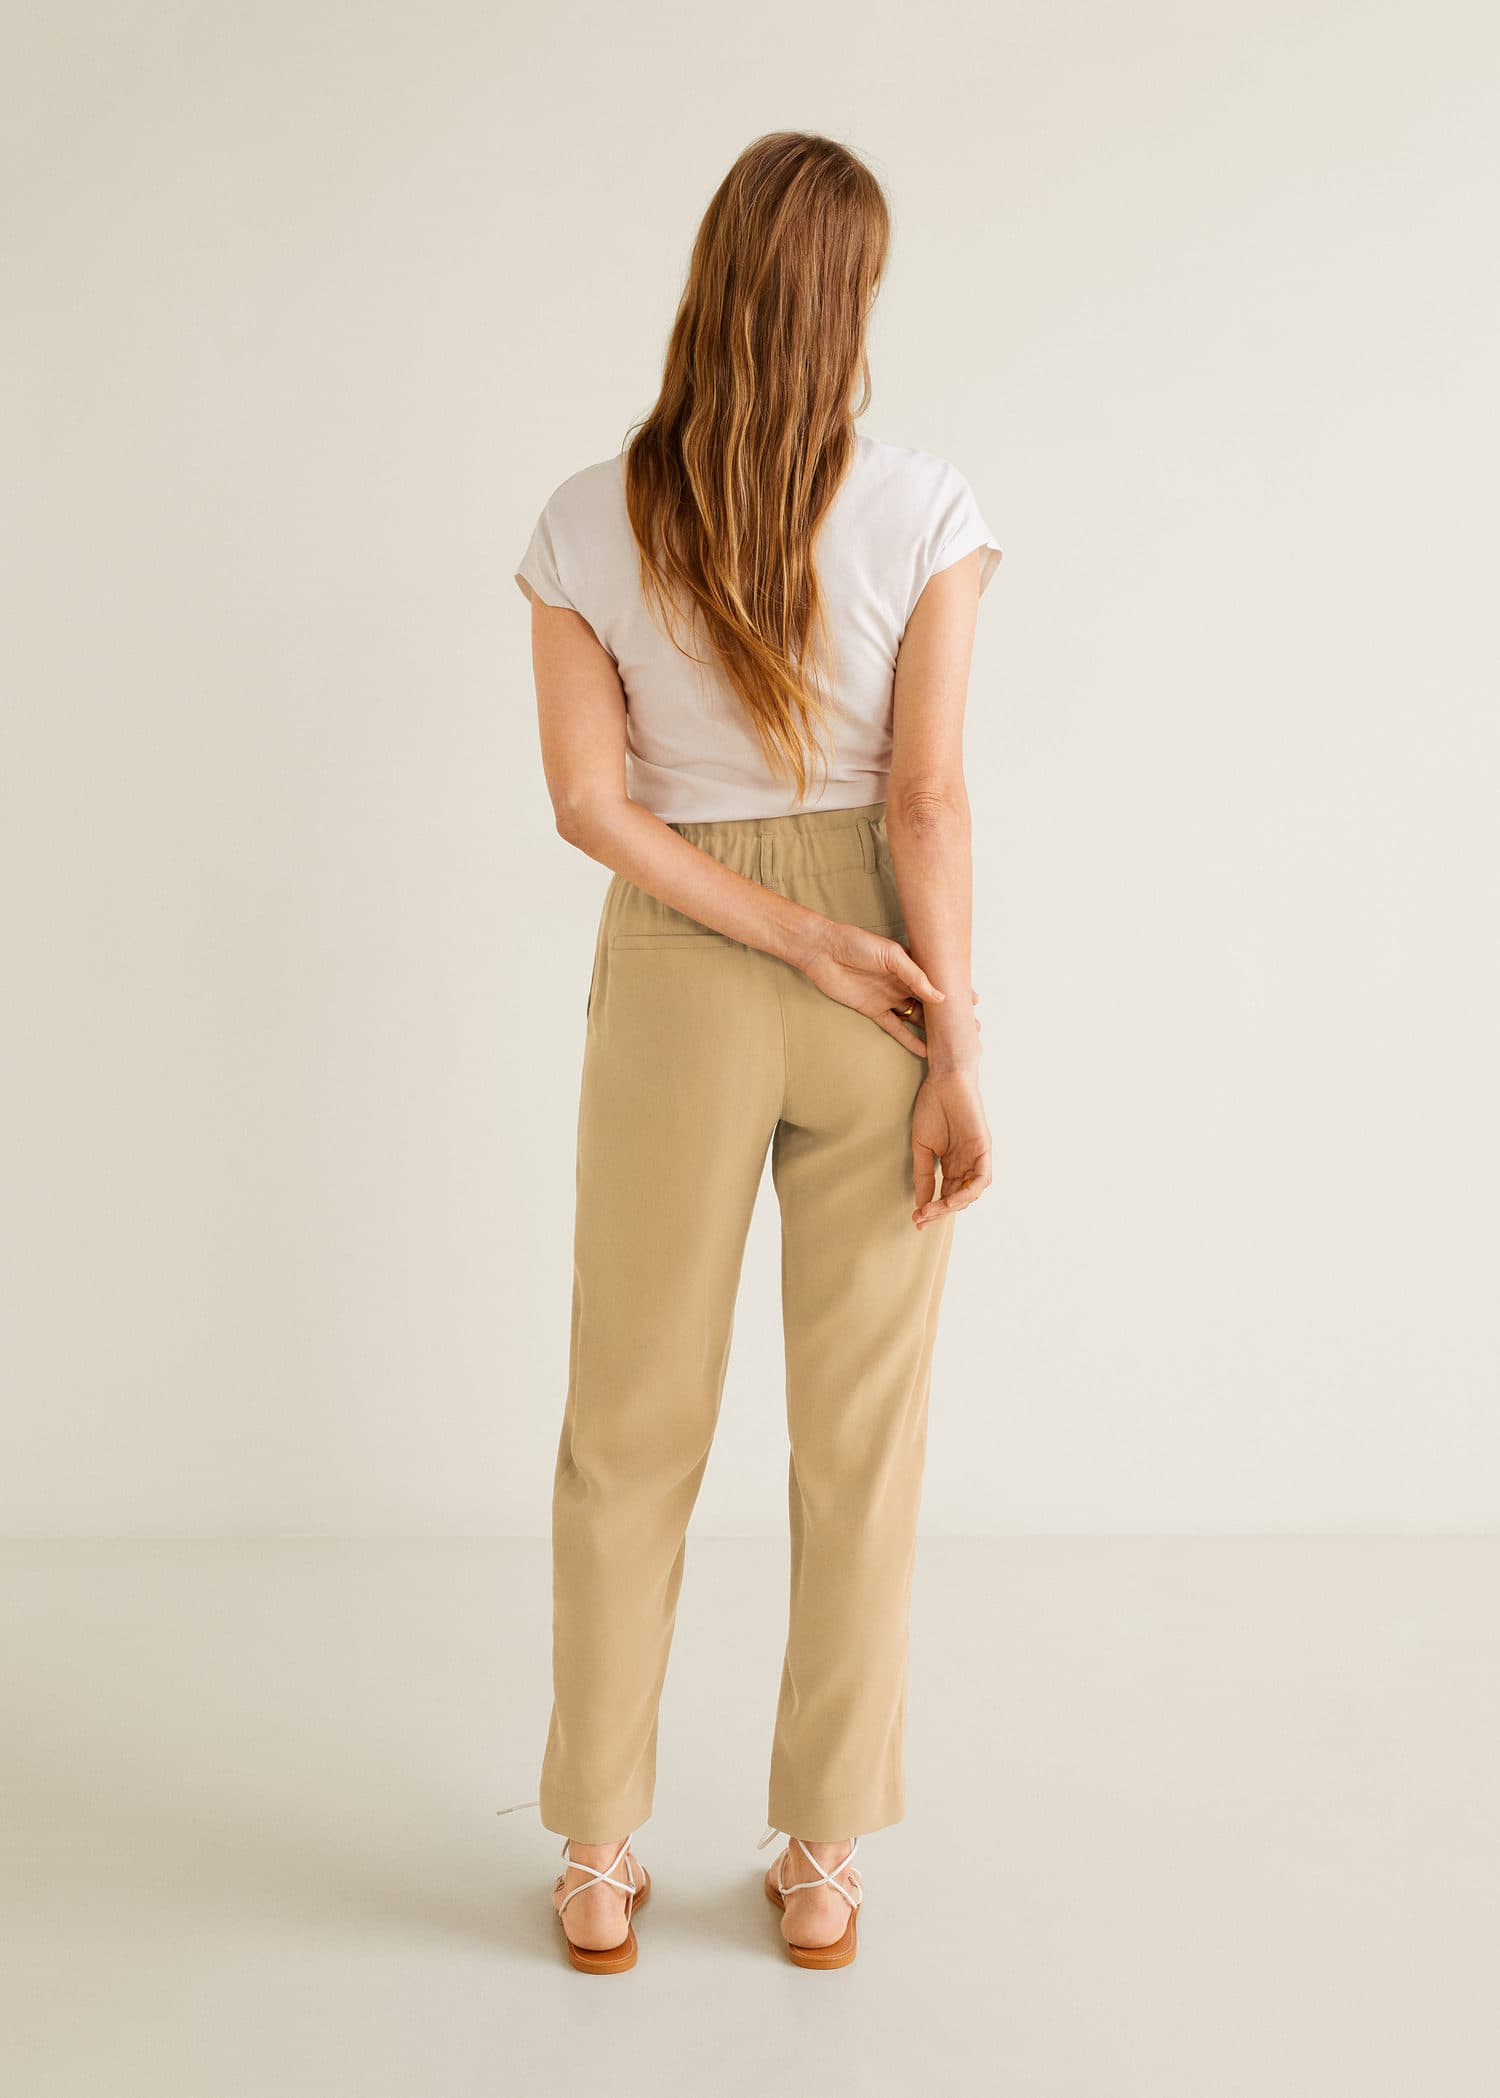 Pantalon taille élastique Femme | Mango France (Guyane